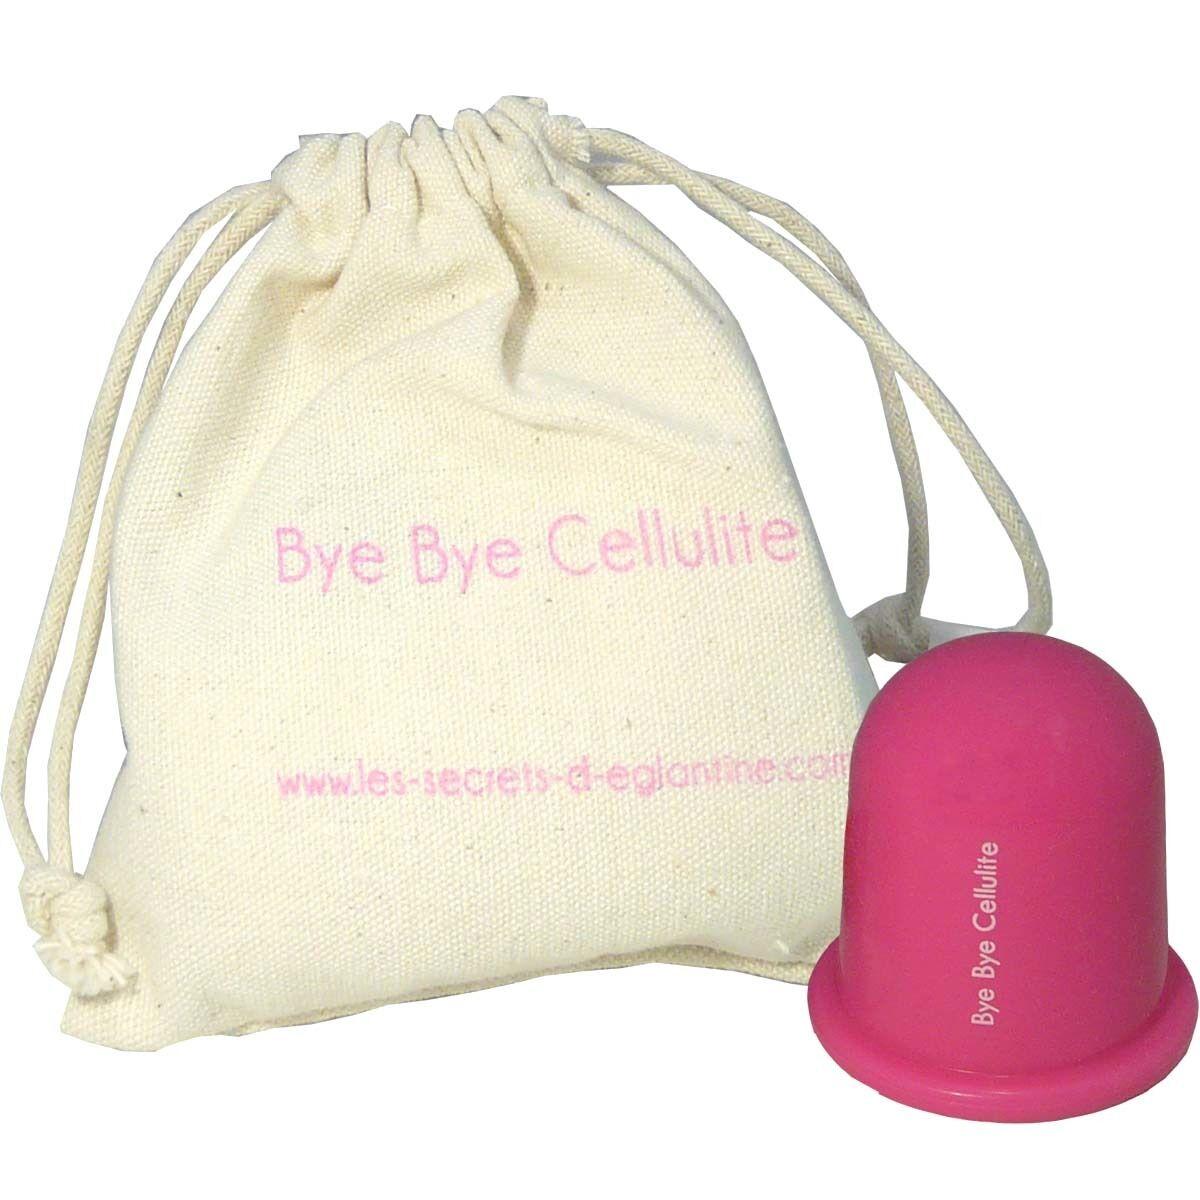 AHAVA Bye bye cellulite ventouse anti-cellulite couleur au choix